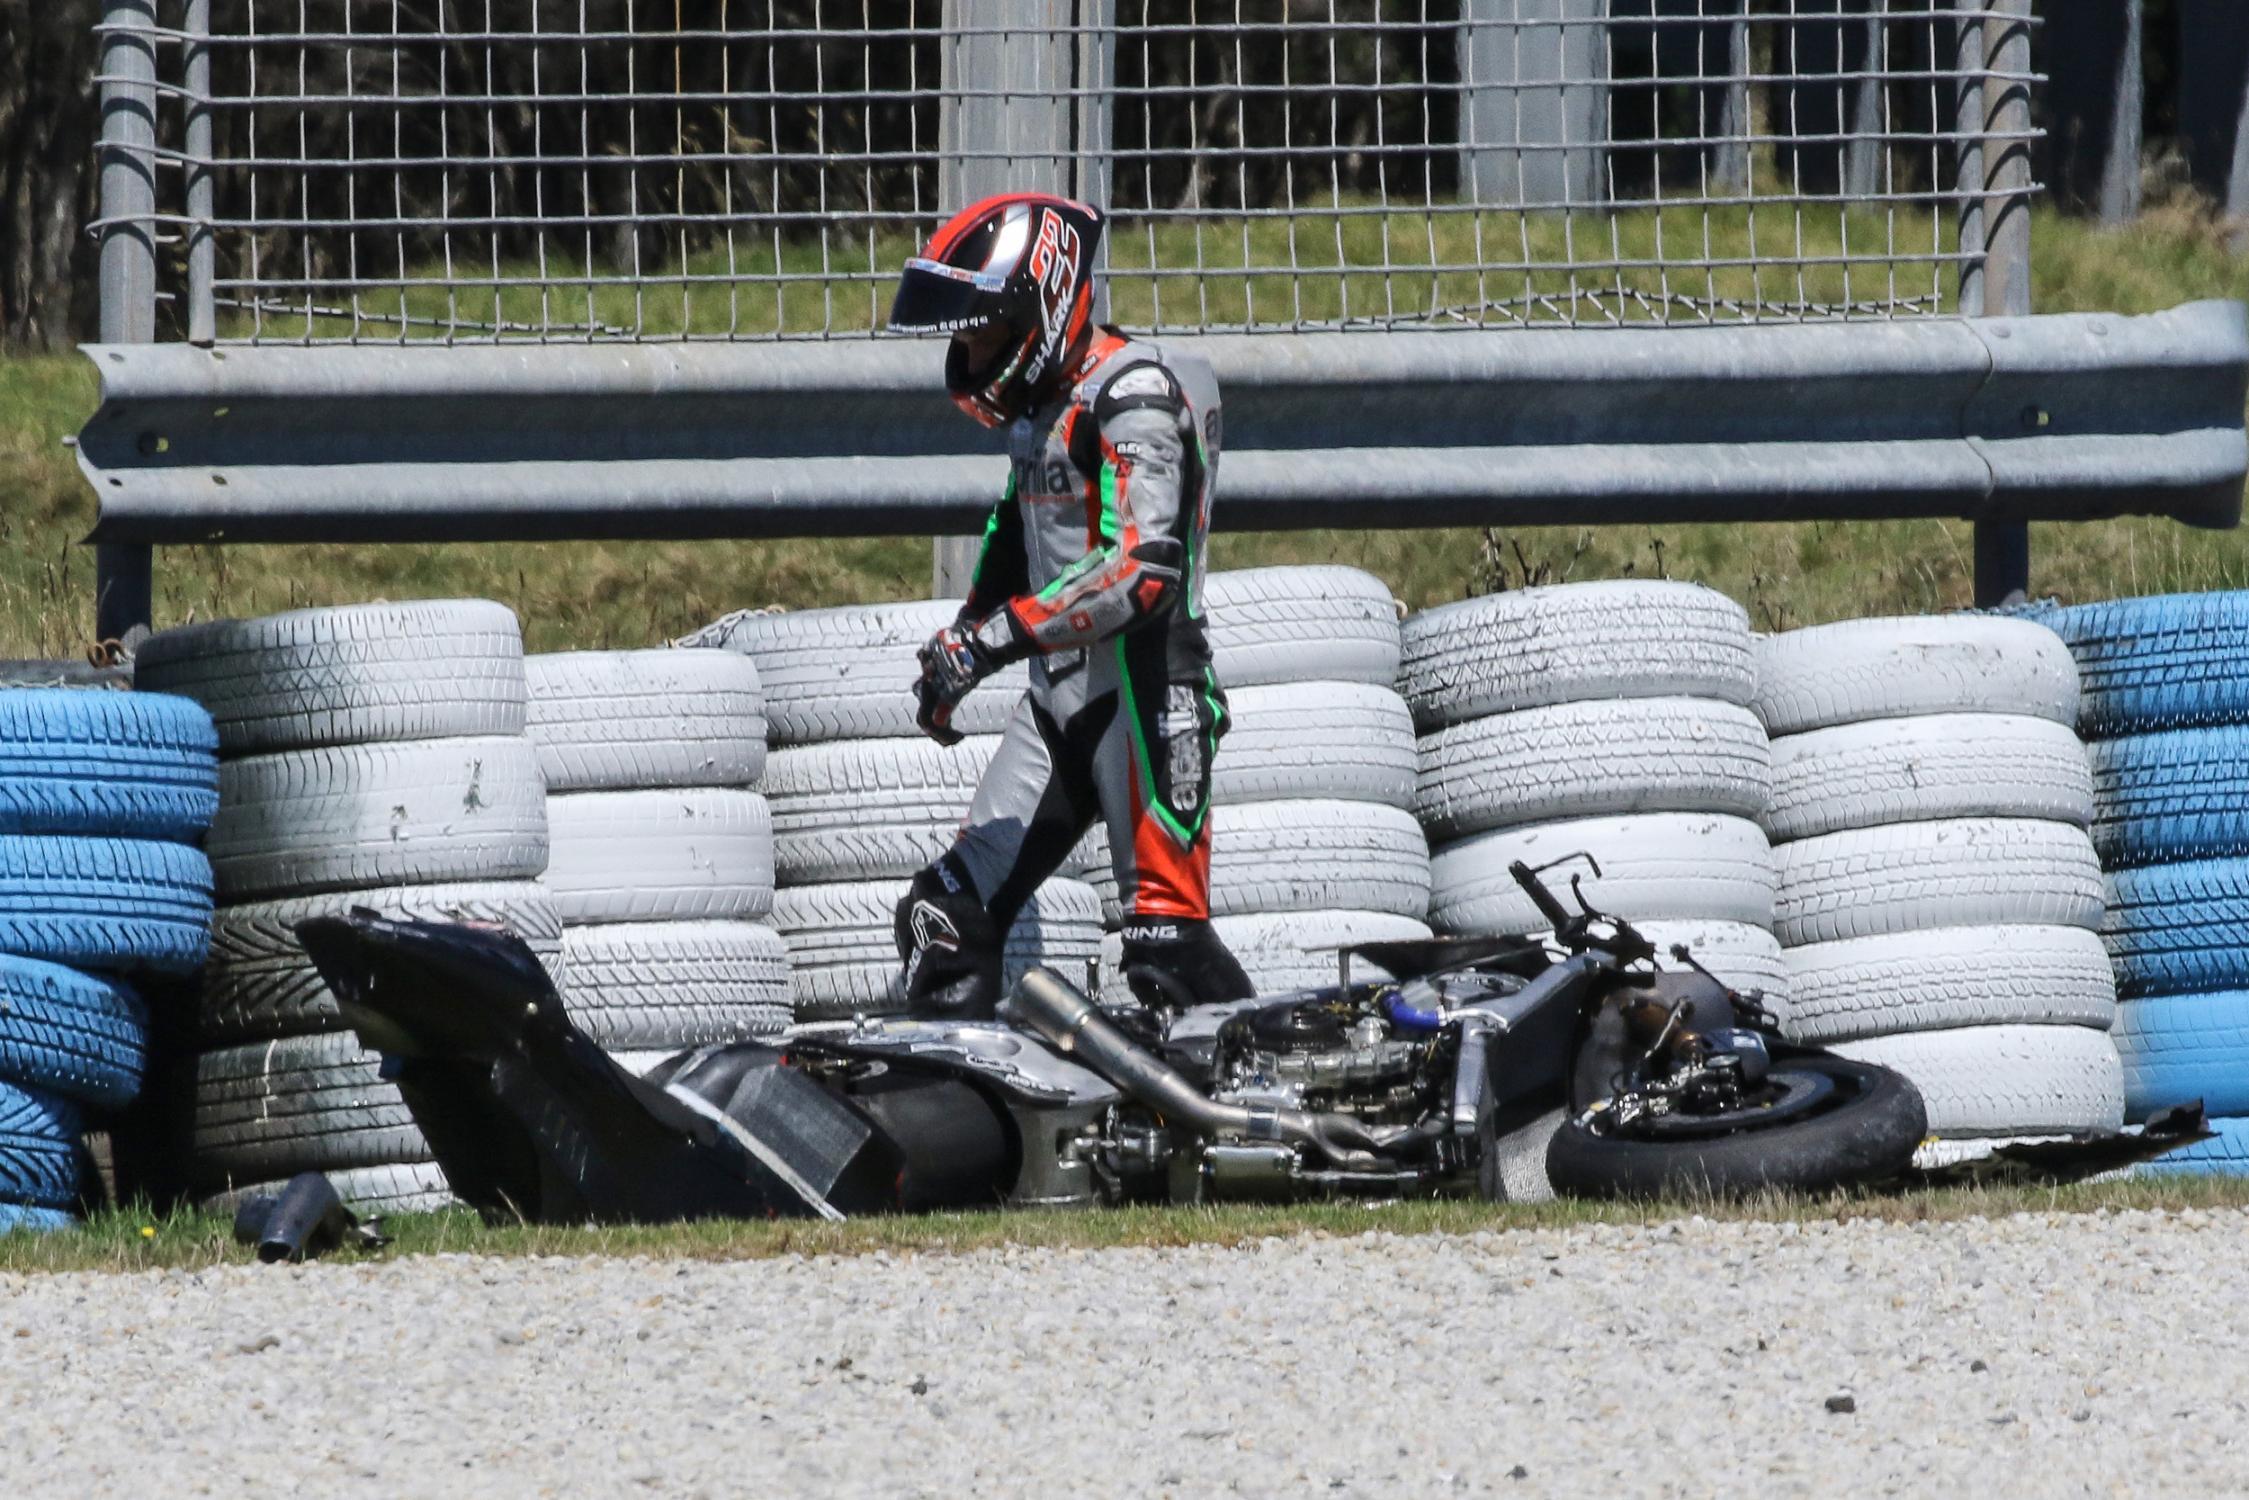 [MotoGP] Test Phillip Island 22-sam-lowes-eng-motogp1p6a1016.gallery_full_top_fullscreen